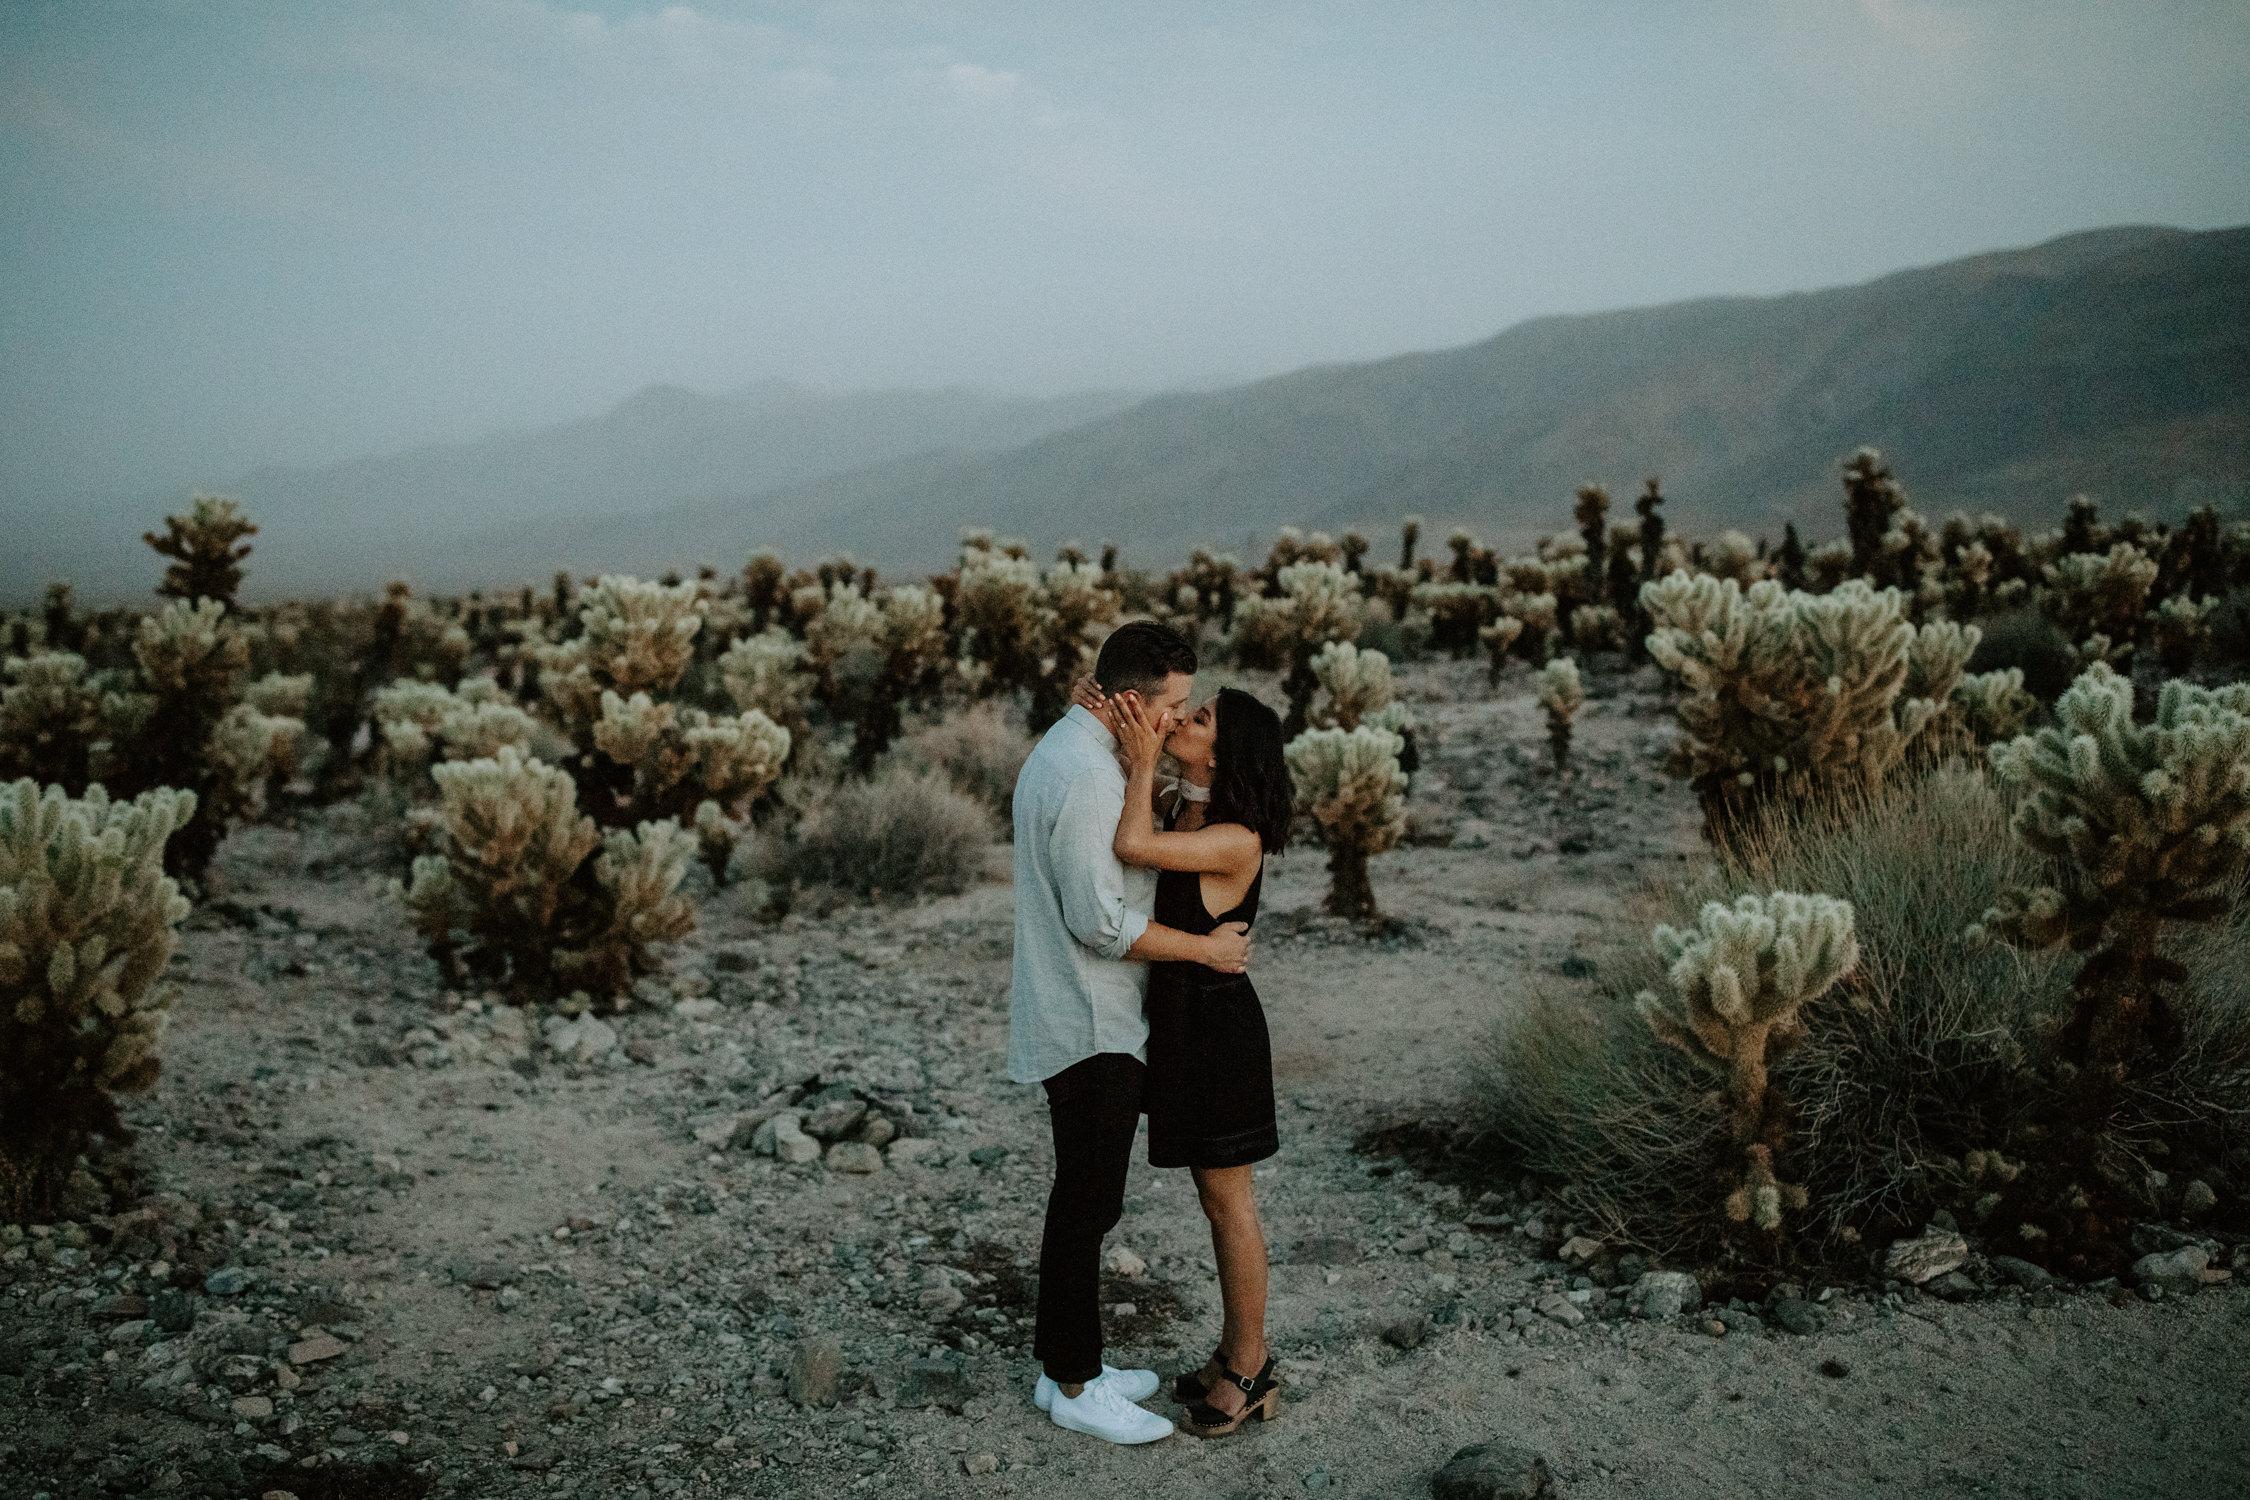 couple-intimate-engagement-session-joshua-tree-64.jpg